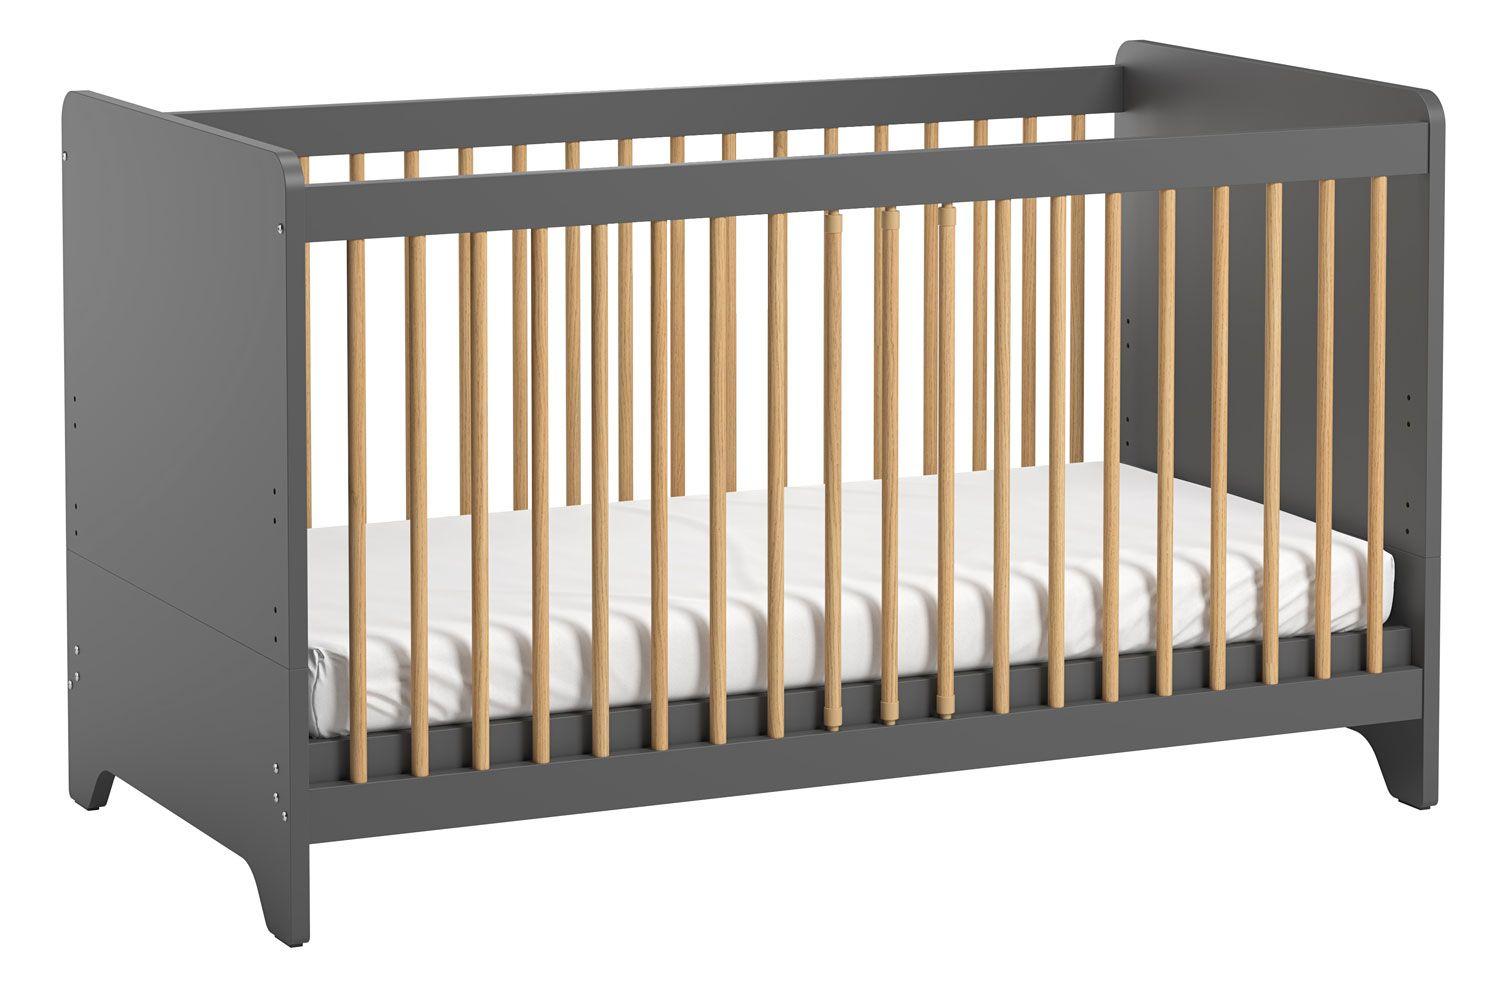 Babybett / Gitterbett Majvi 04, Farbe: Grau / Eiche - Liegefläche: 70 x 140 cm (B x L)